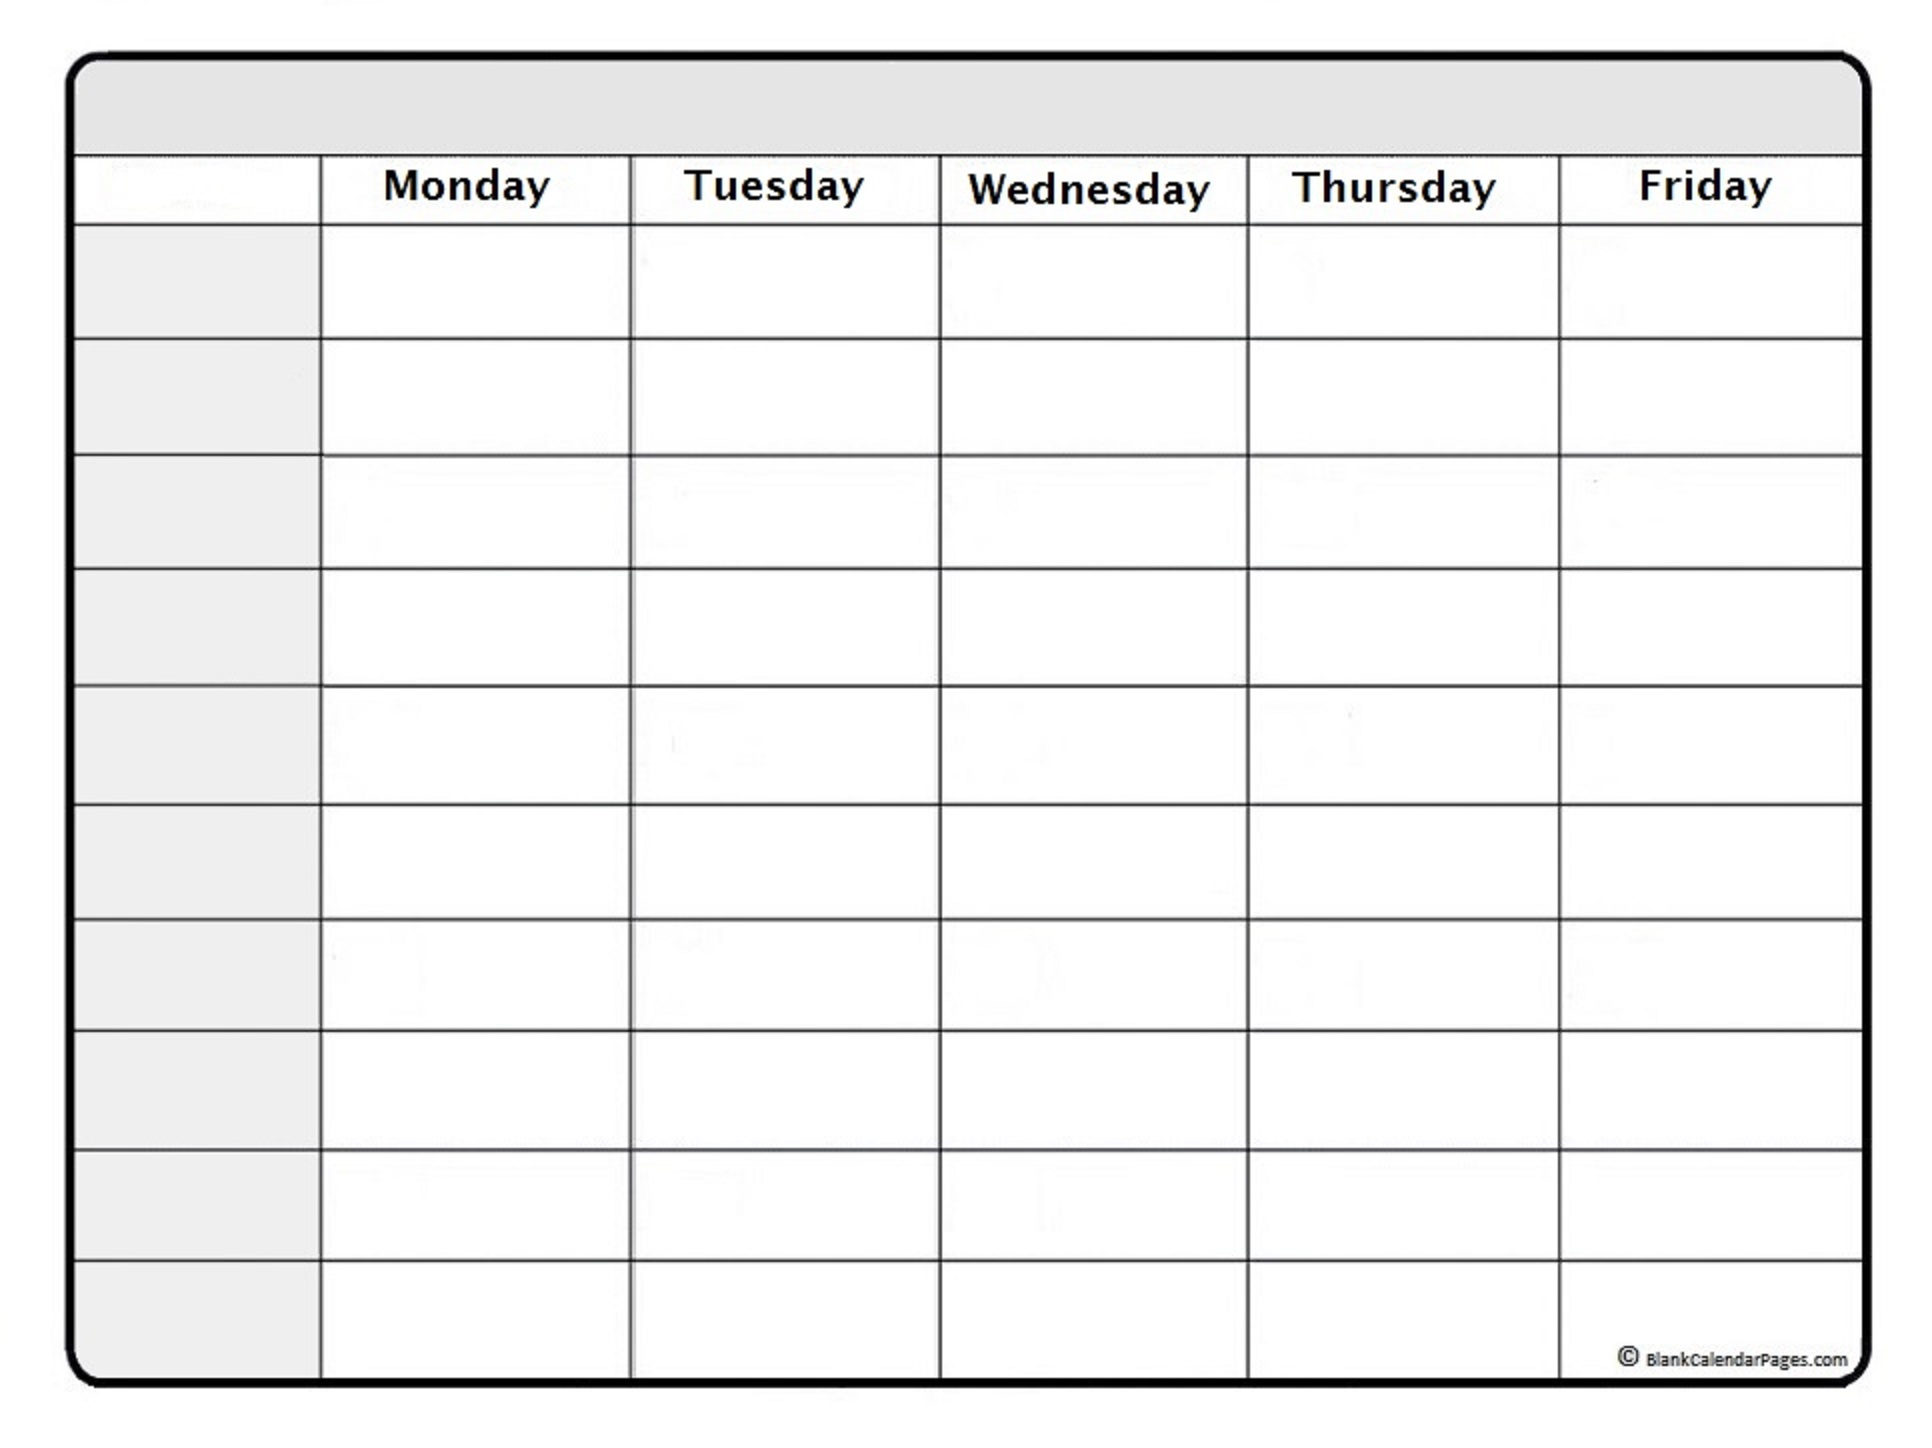 January 2020 Weekly Calendar January 2020 Weekly Calendar